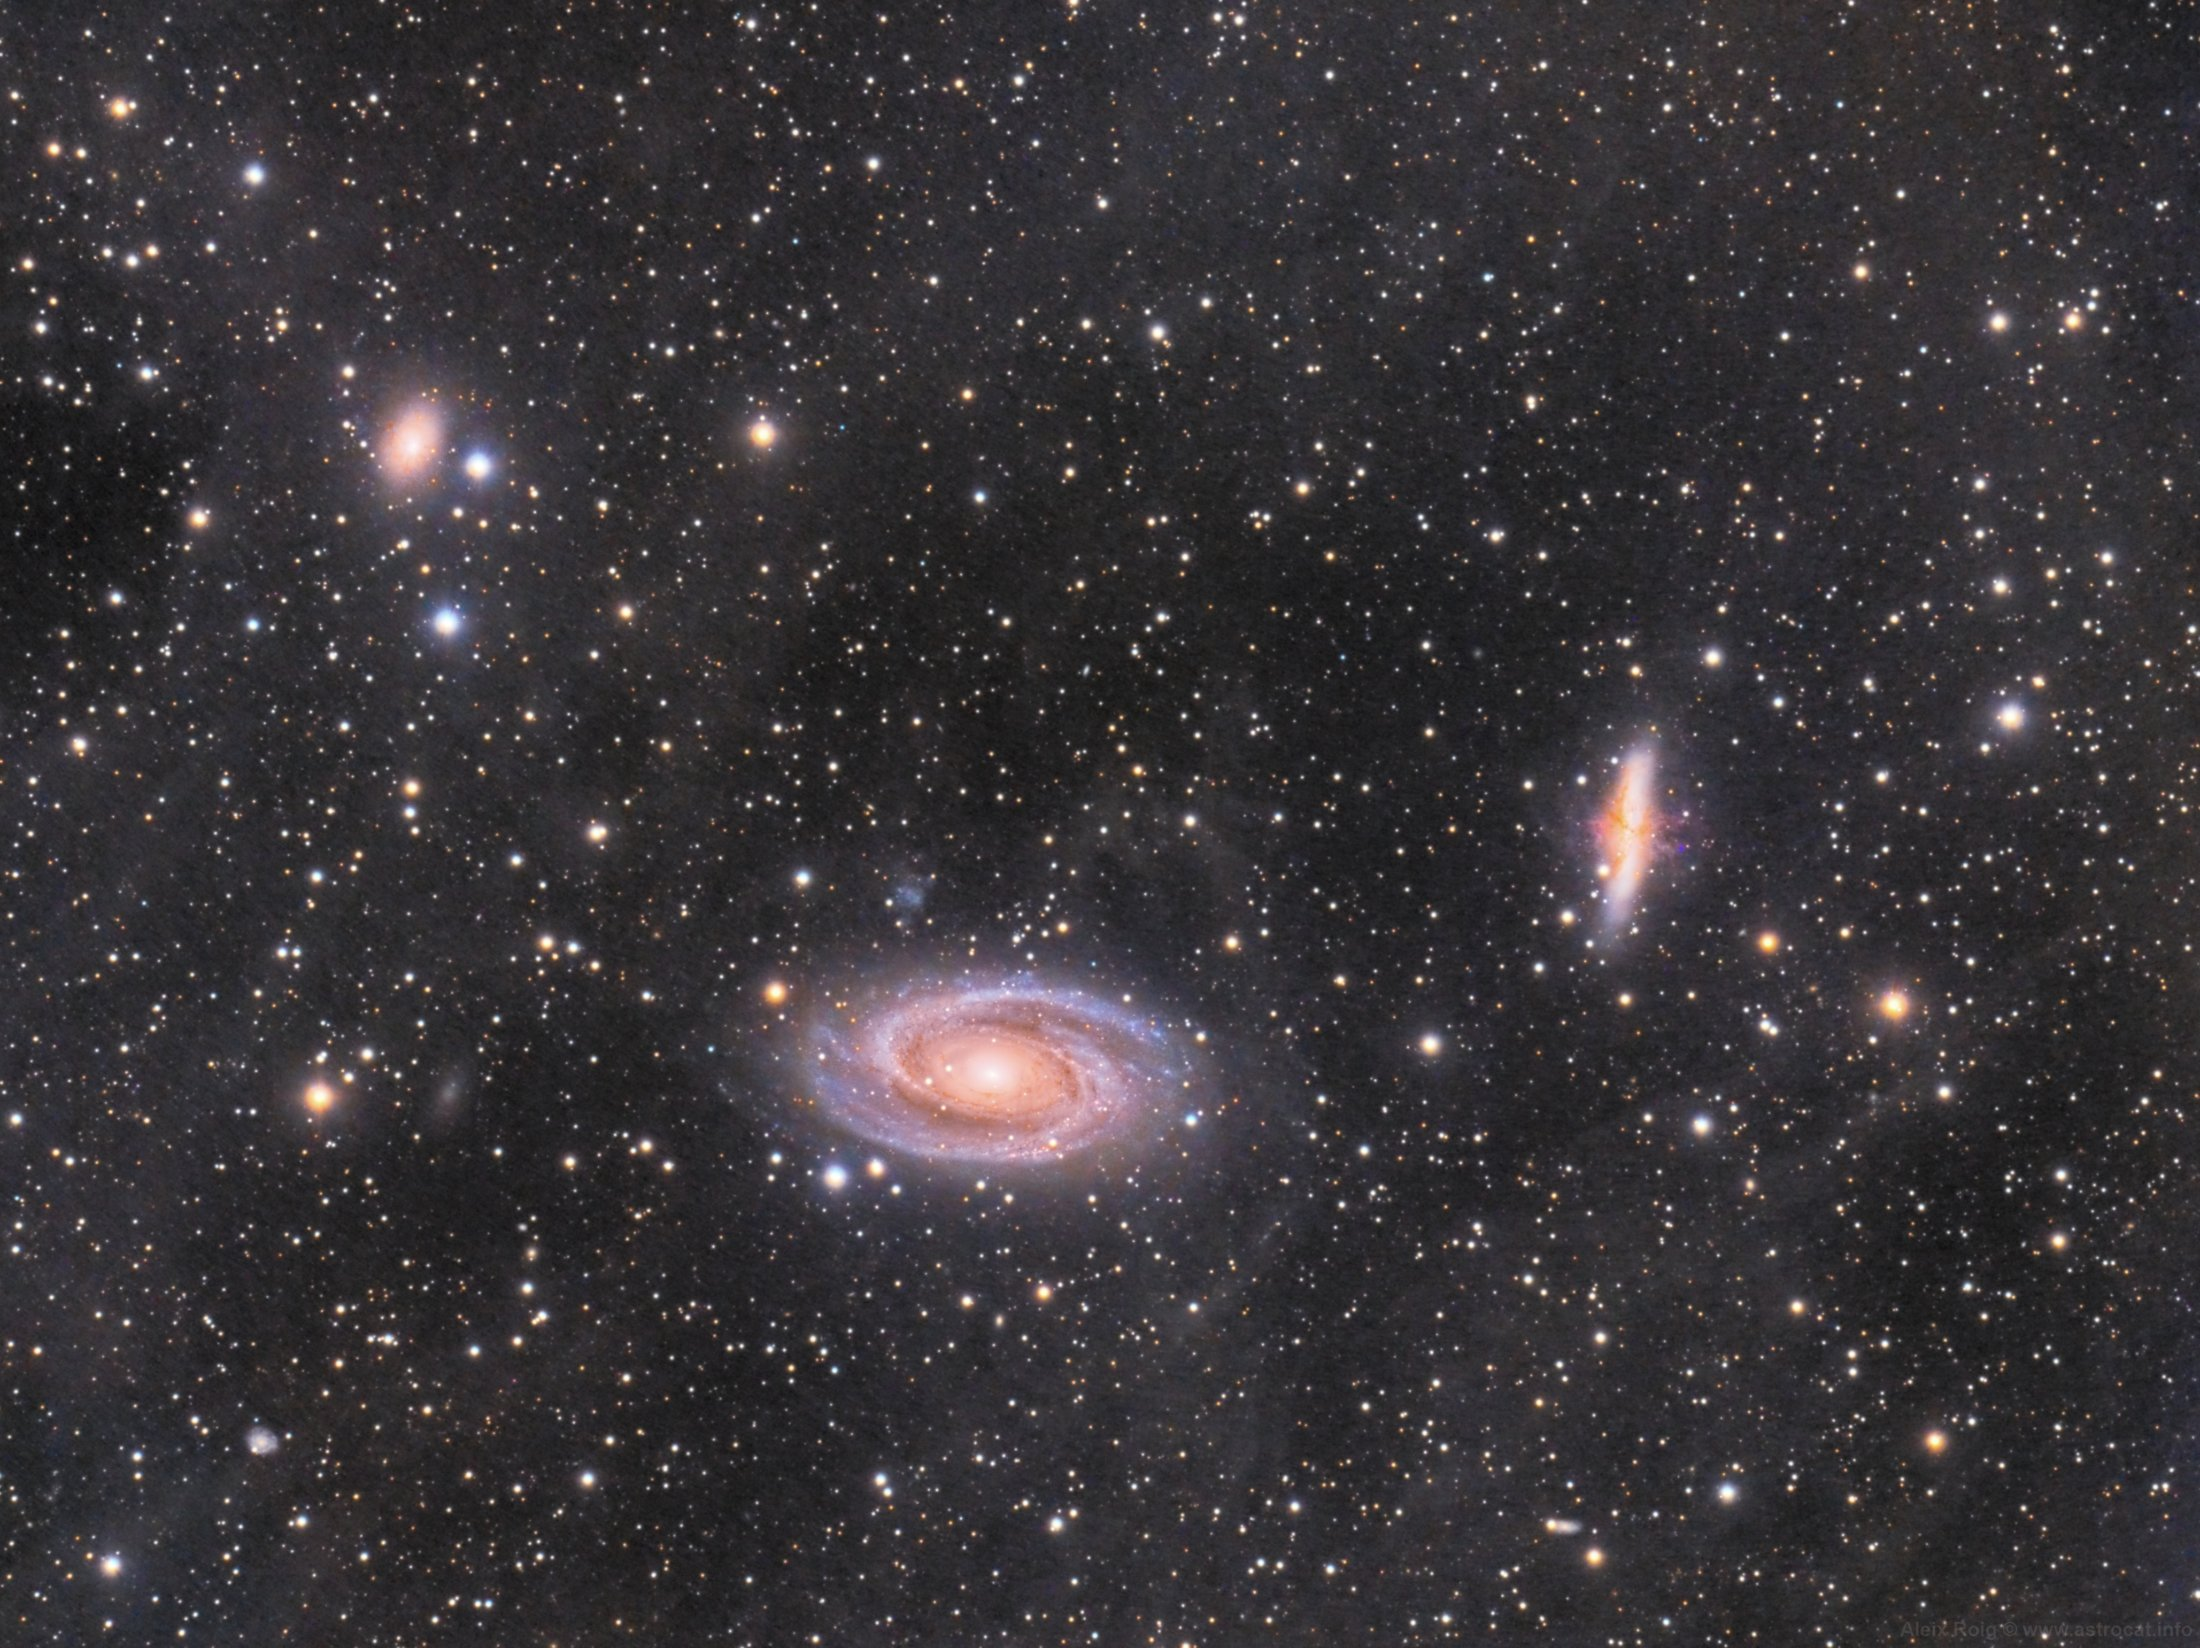 M81 - M82 - NGC3077 - Aleix Roig